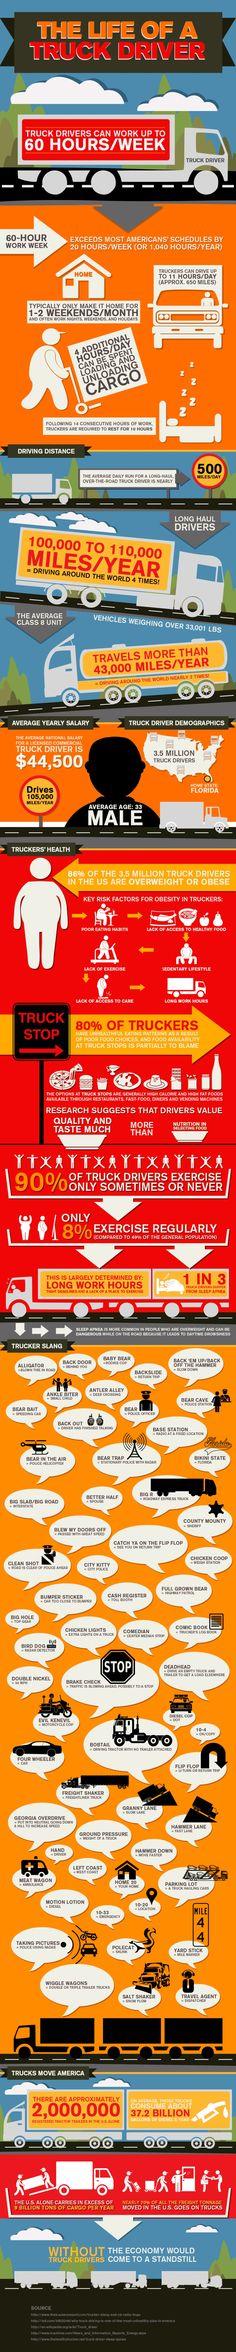 Driver Life Infographic - NextTruck Online